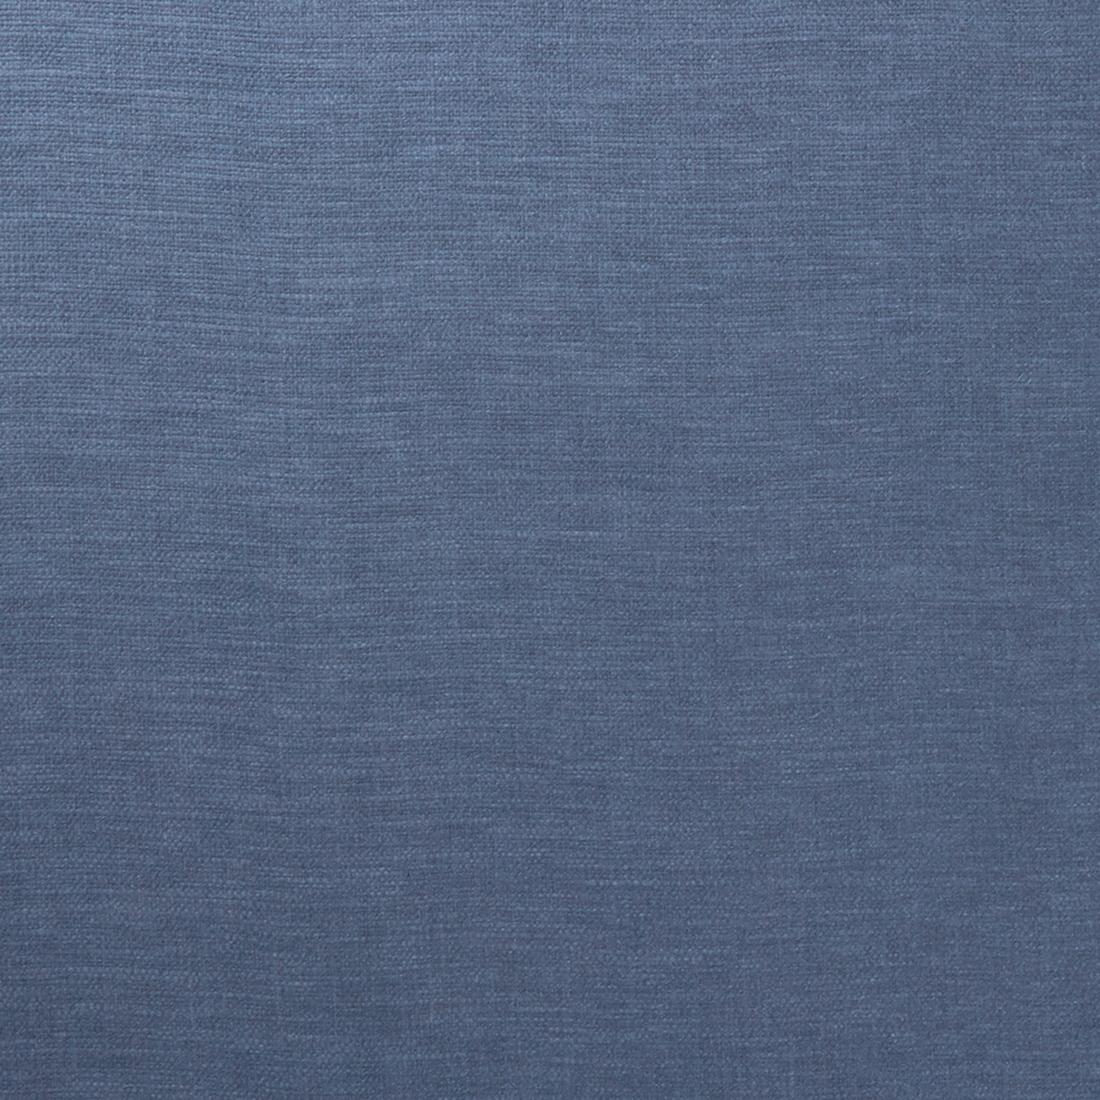 Lunar Danube Upholstery Fabric